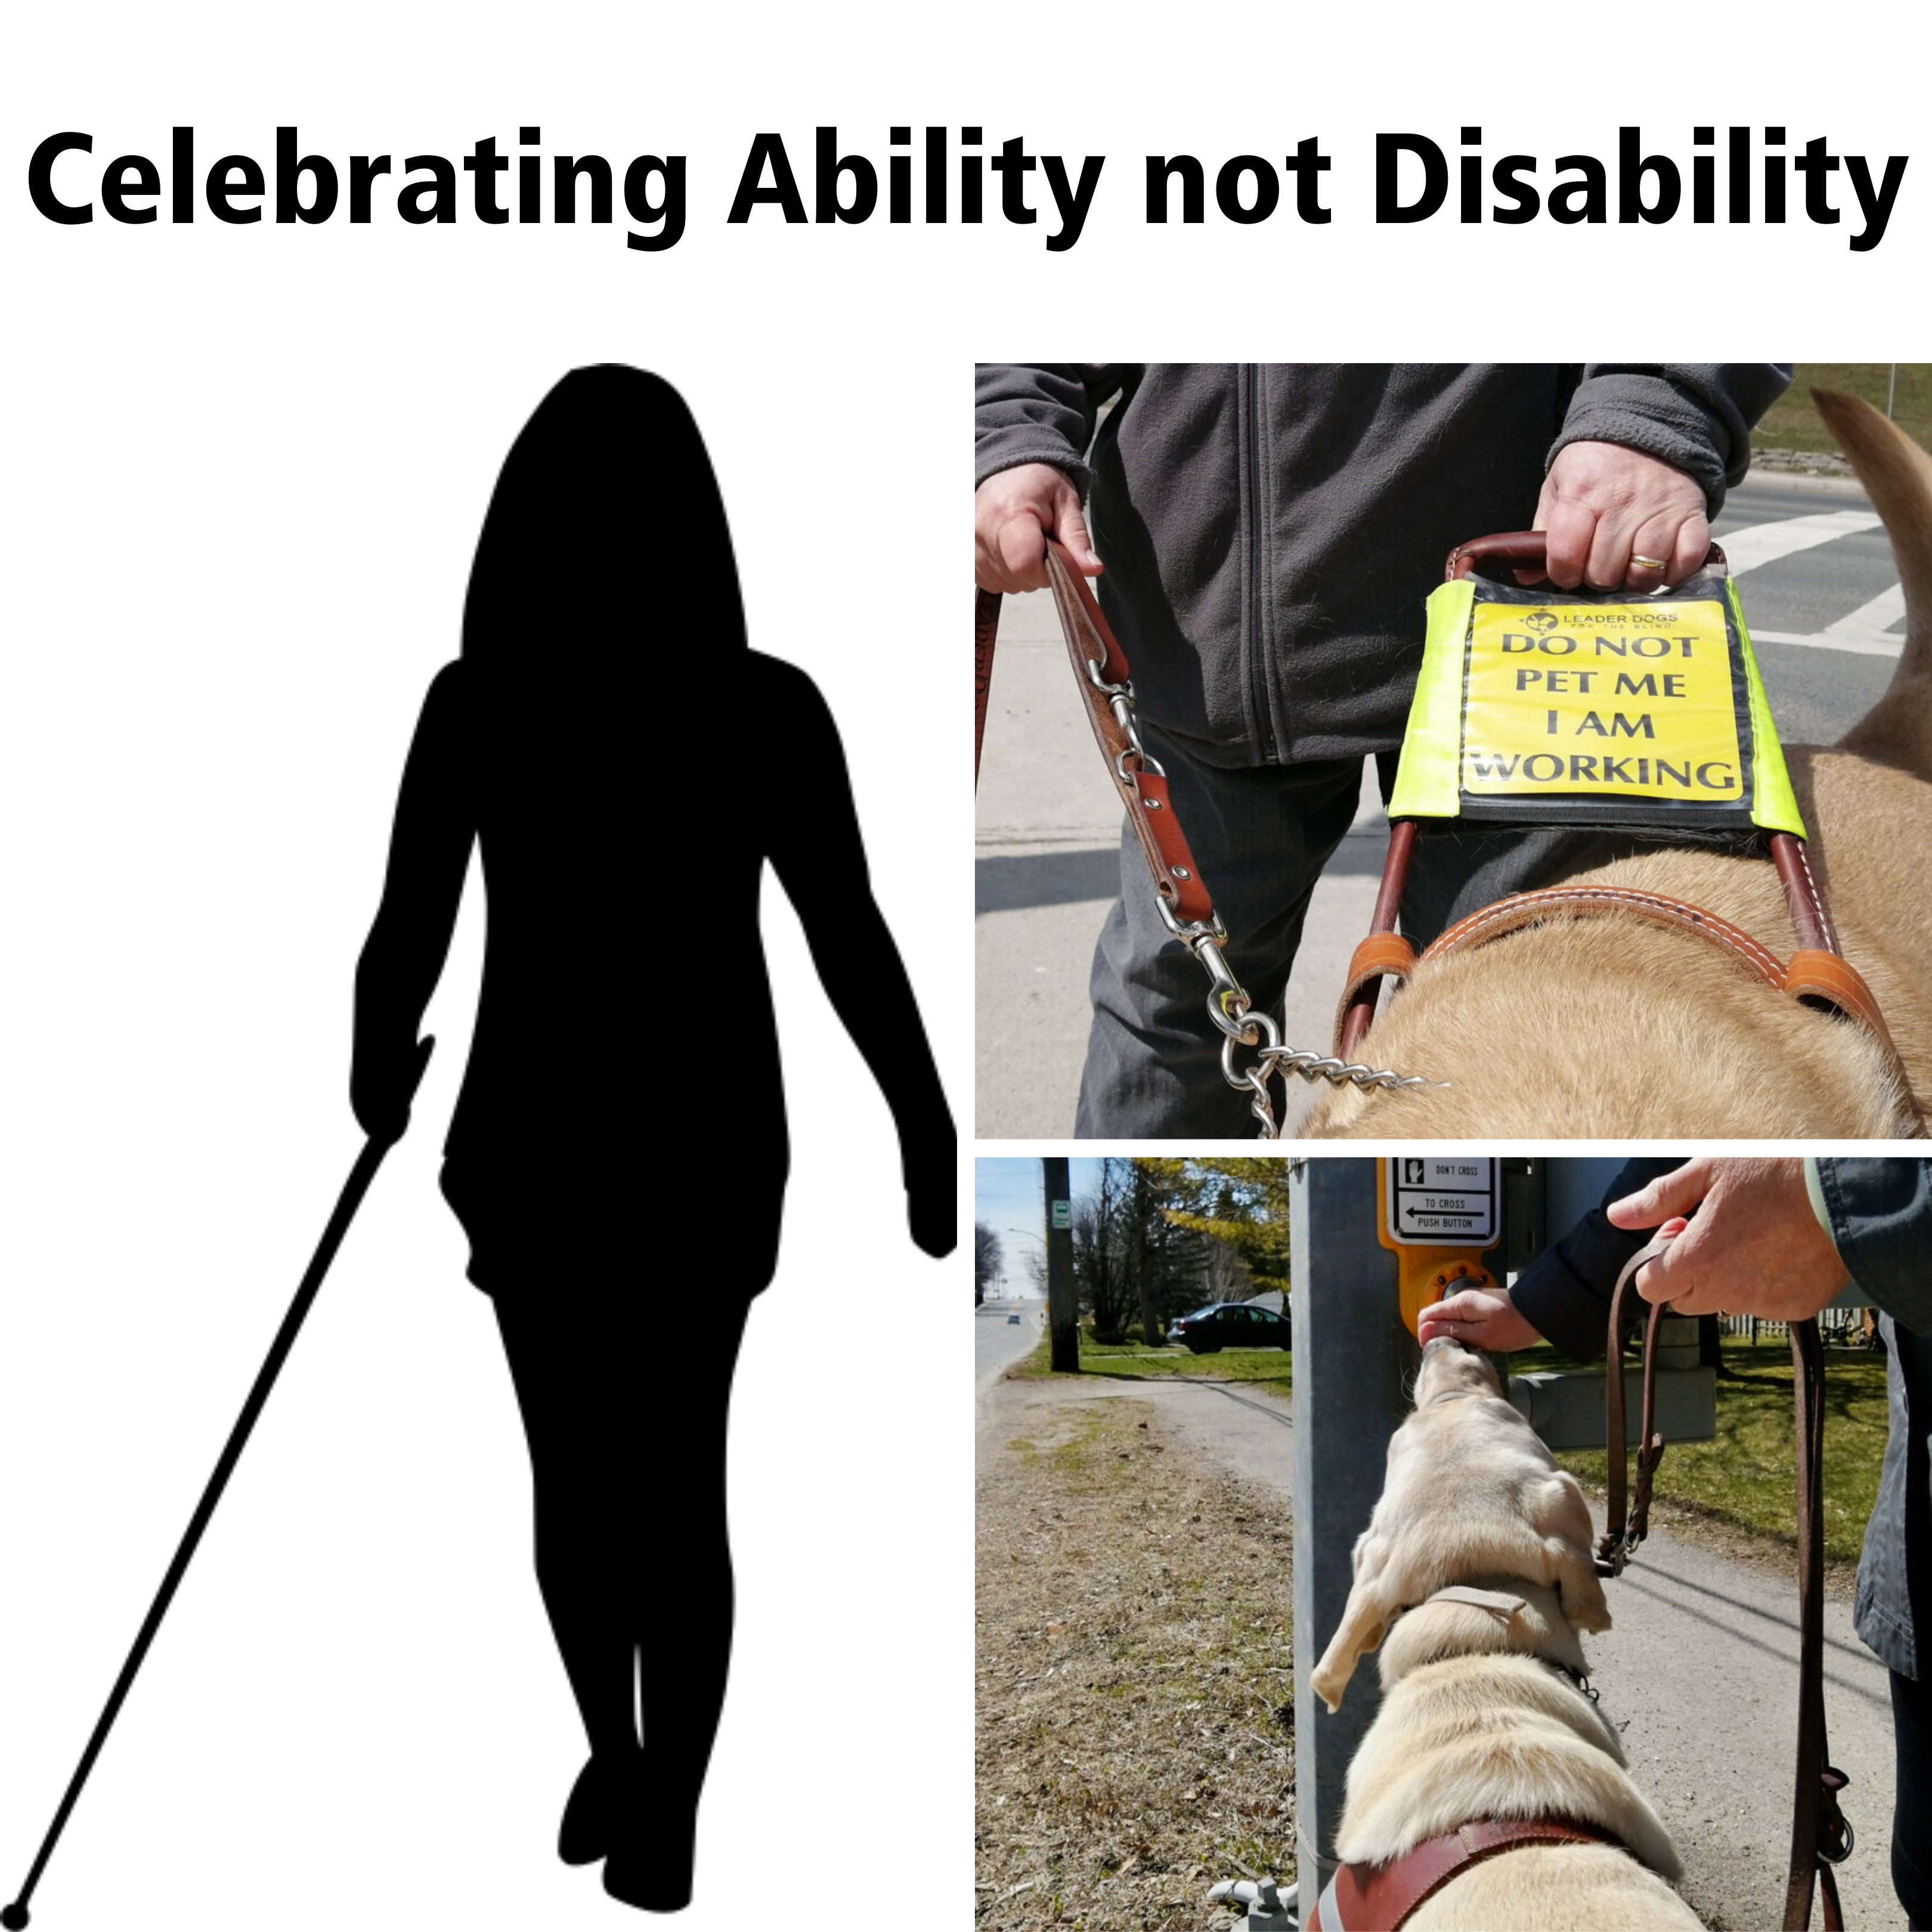 Celebrating Ability Not Disability